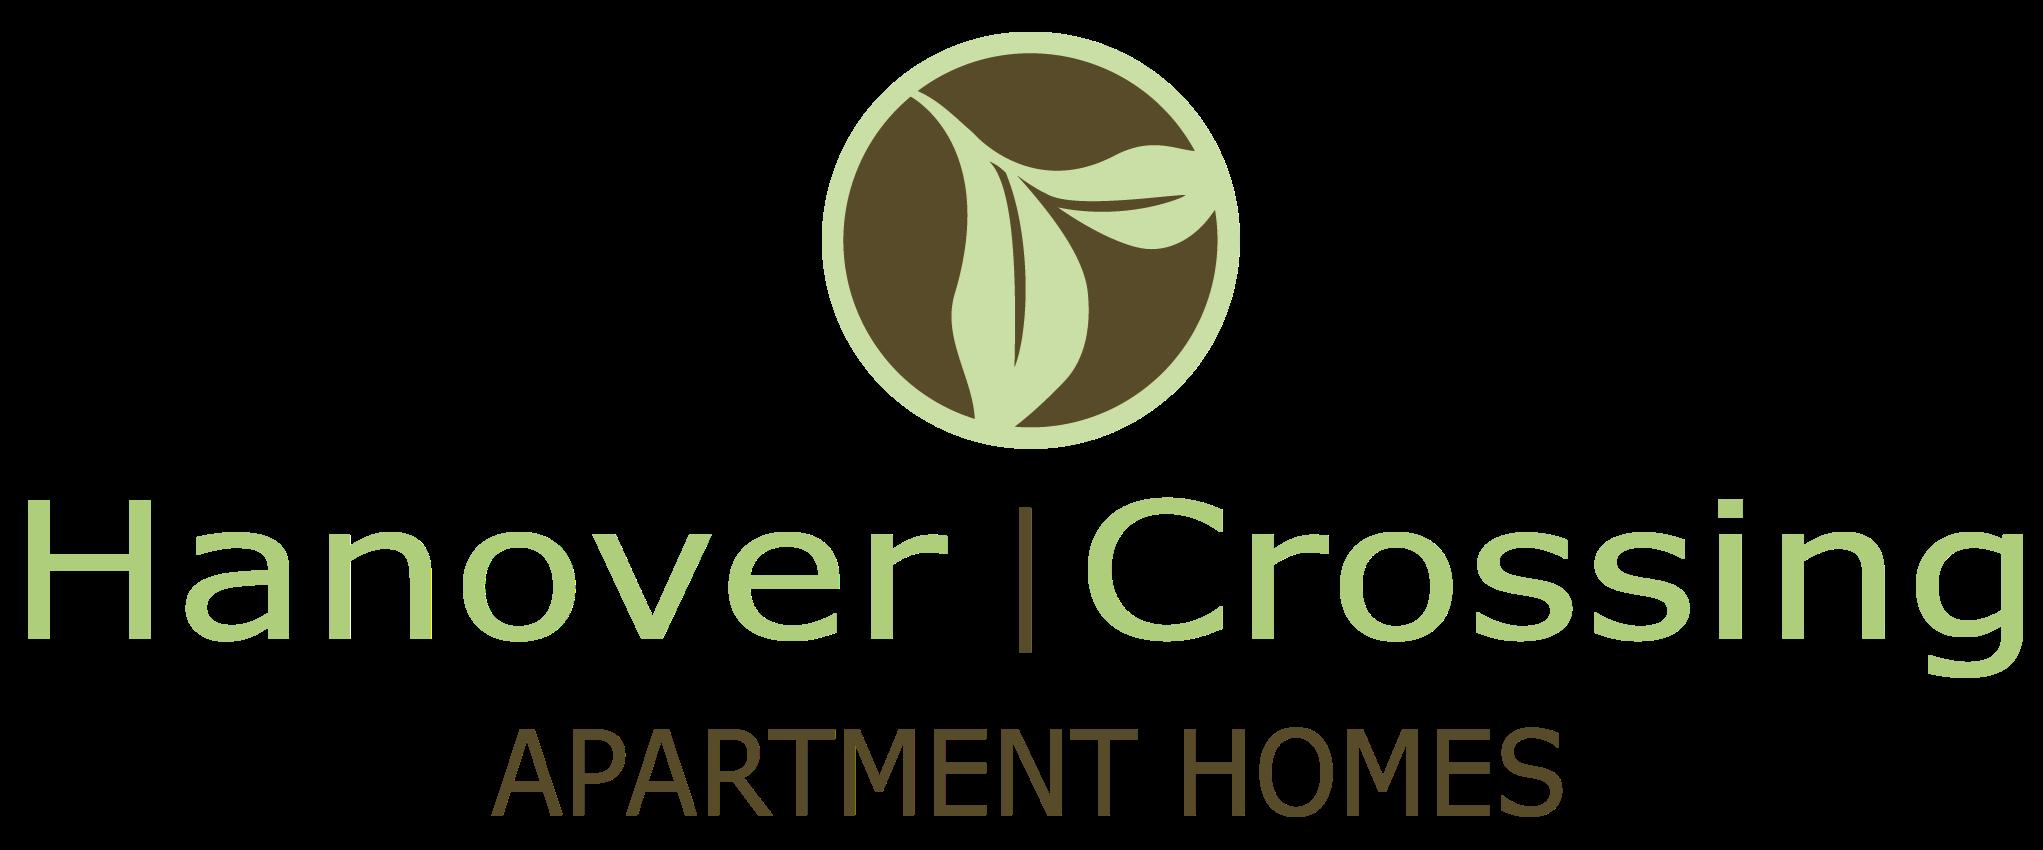 Hanover_Crossing_logo